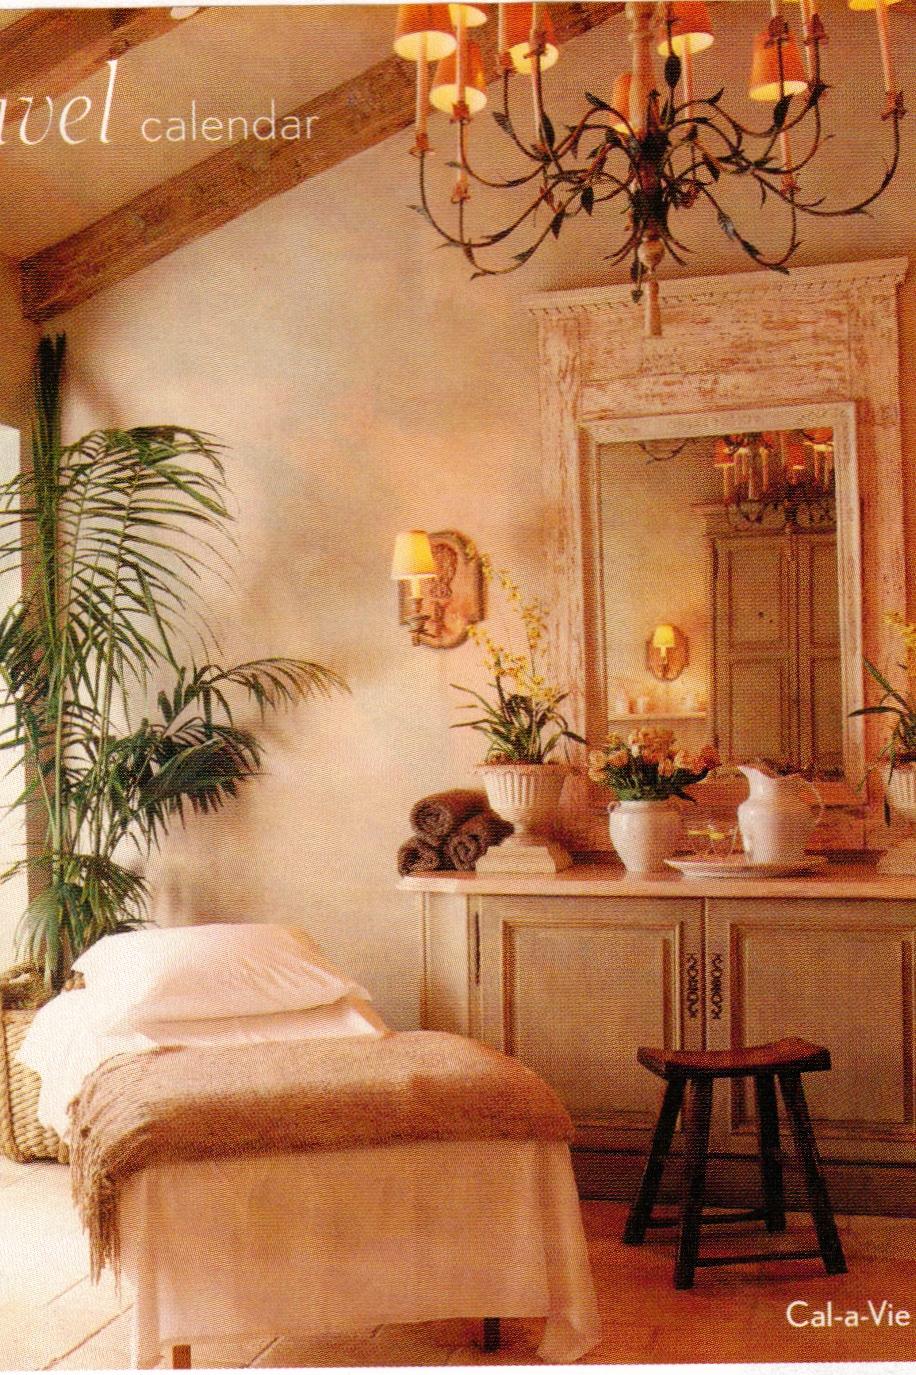 Interior design award winning cal a vie leslie mcgwire on for Hotel spa decor